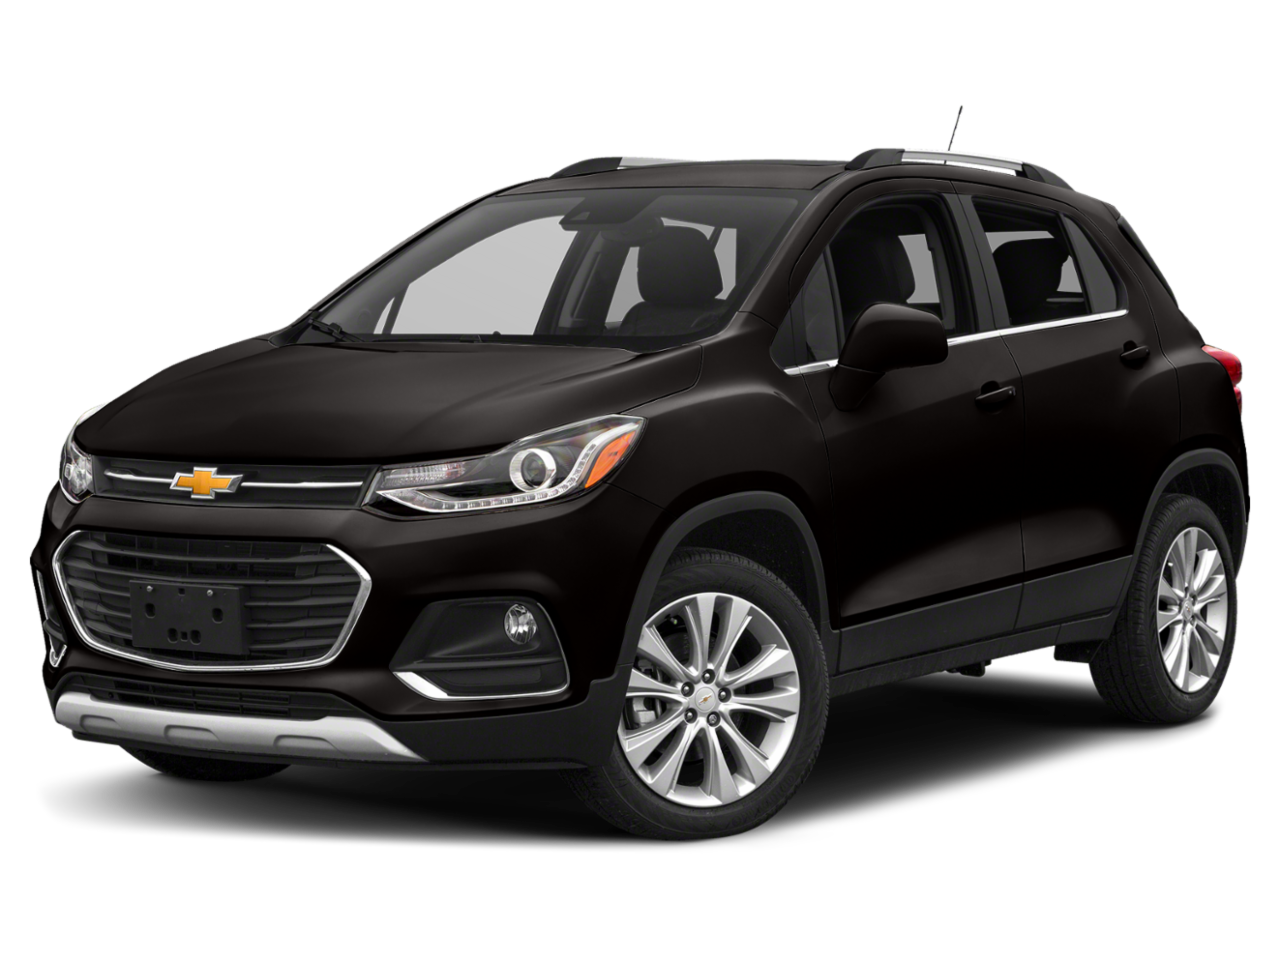 Mccarthy Chevrolet Olathe >> McCarthy Chevrolet | Customer Reviews | Olathe